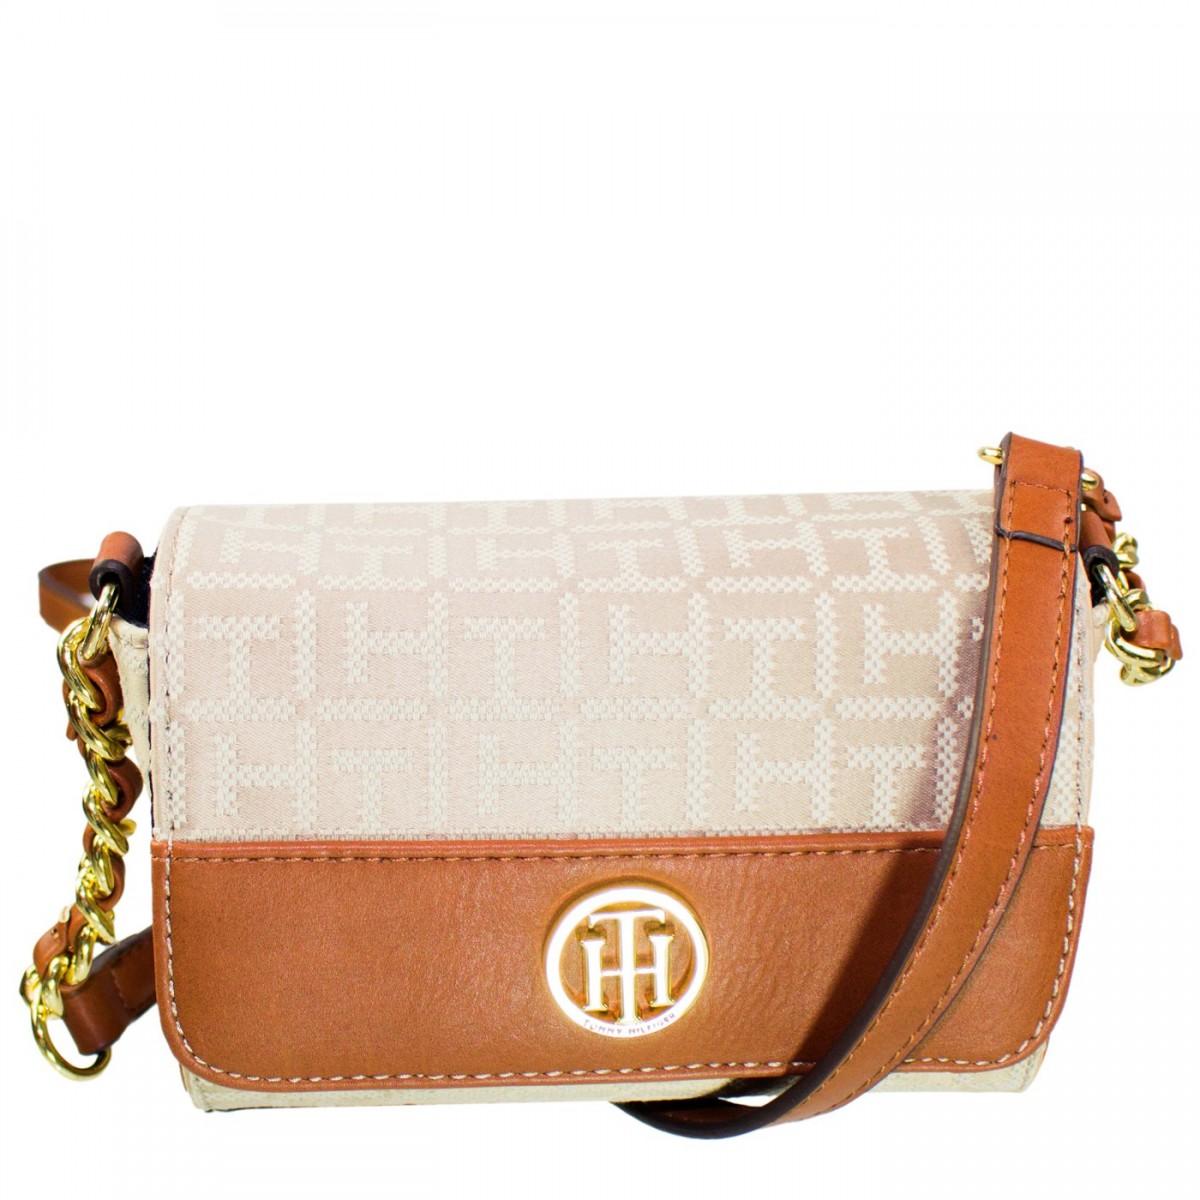 40174a2a9 Bizz Store - Bolsa Tommy Hilfiger Lucie Jacquard Flap Crossove